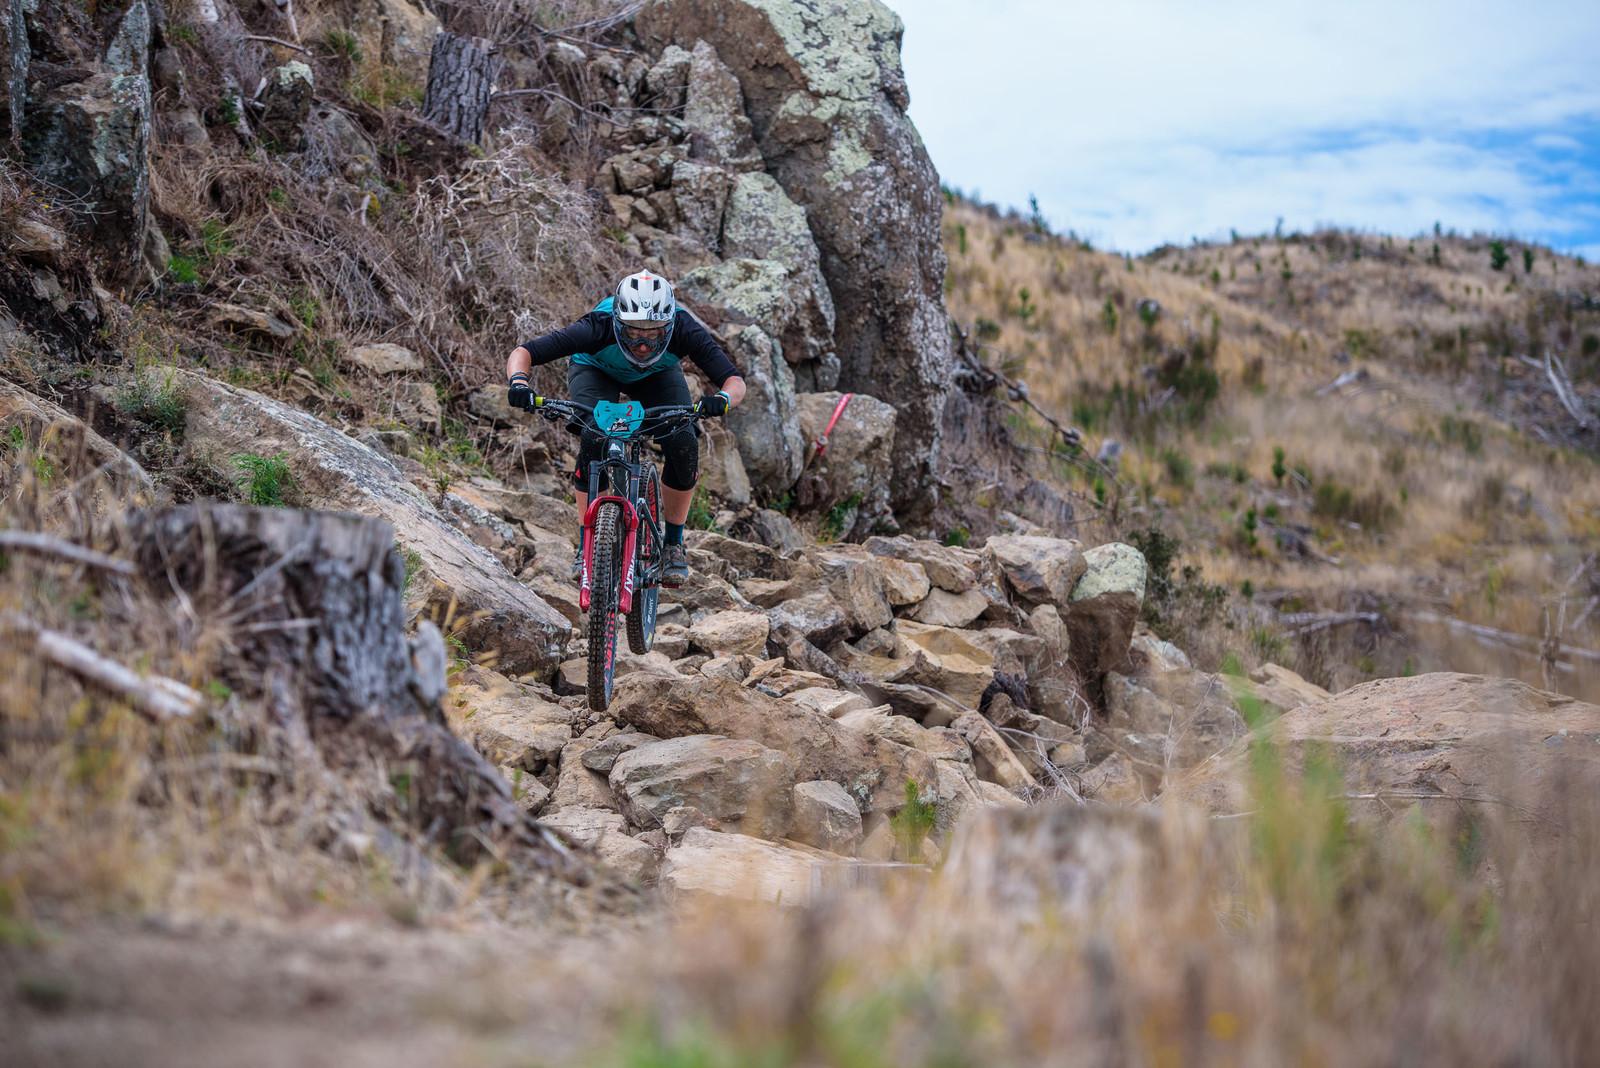 NZenduro19 day 3 DShaw-8559 - 2019 NZ Enduro Day 3 Photo Gallery - Mountain Biking Pictures - Vital MTB